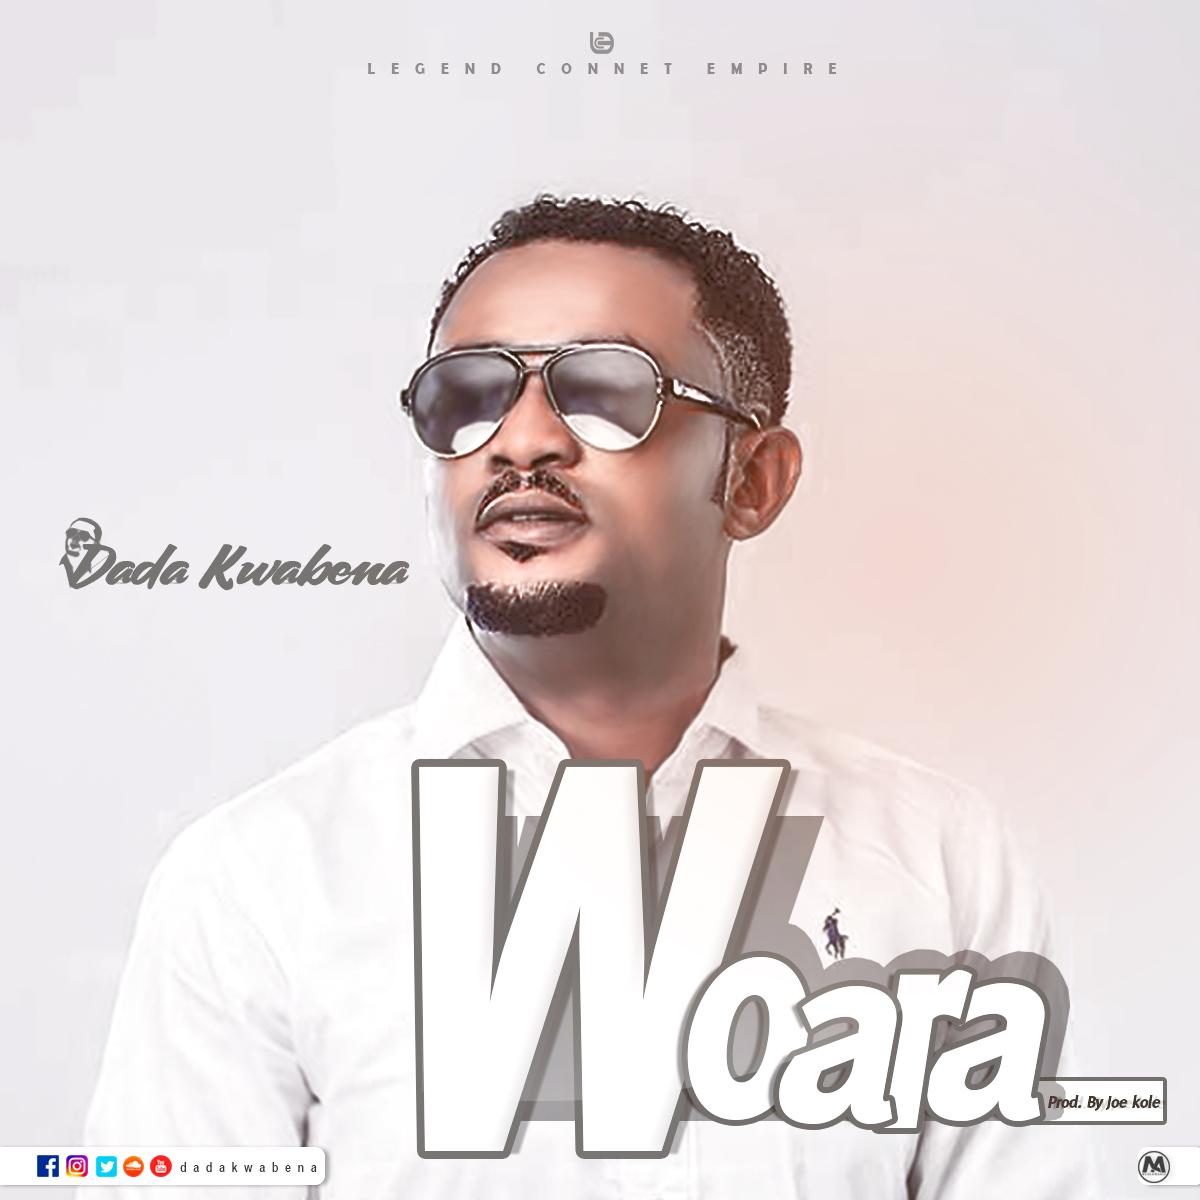 Dada Kwabena Woara Produced By Joe Kole